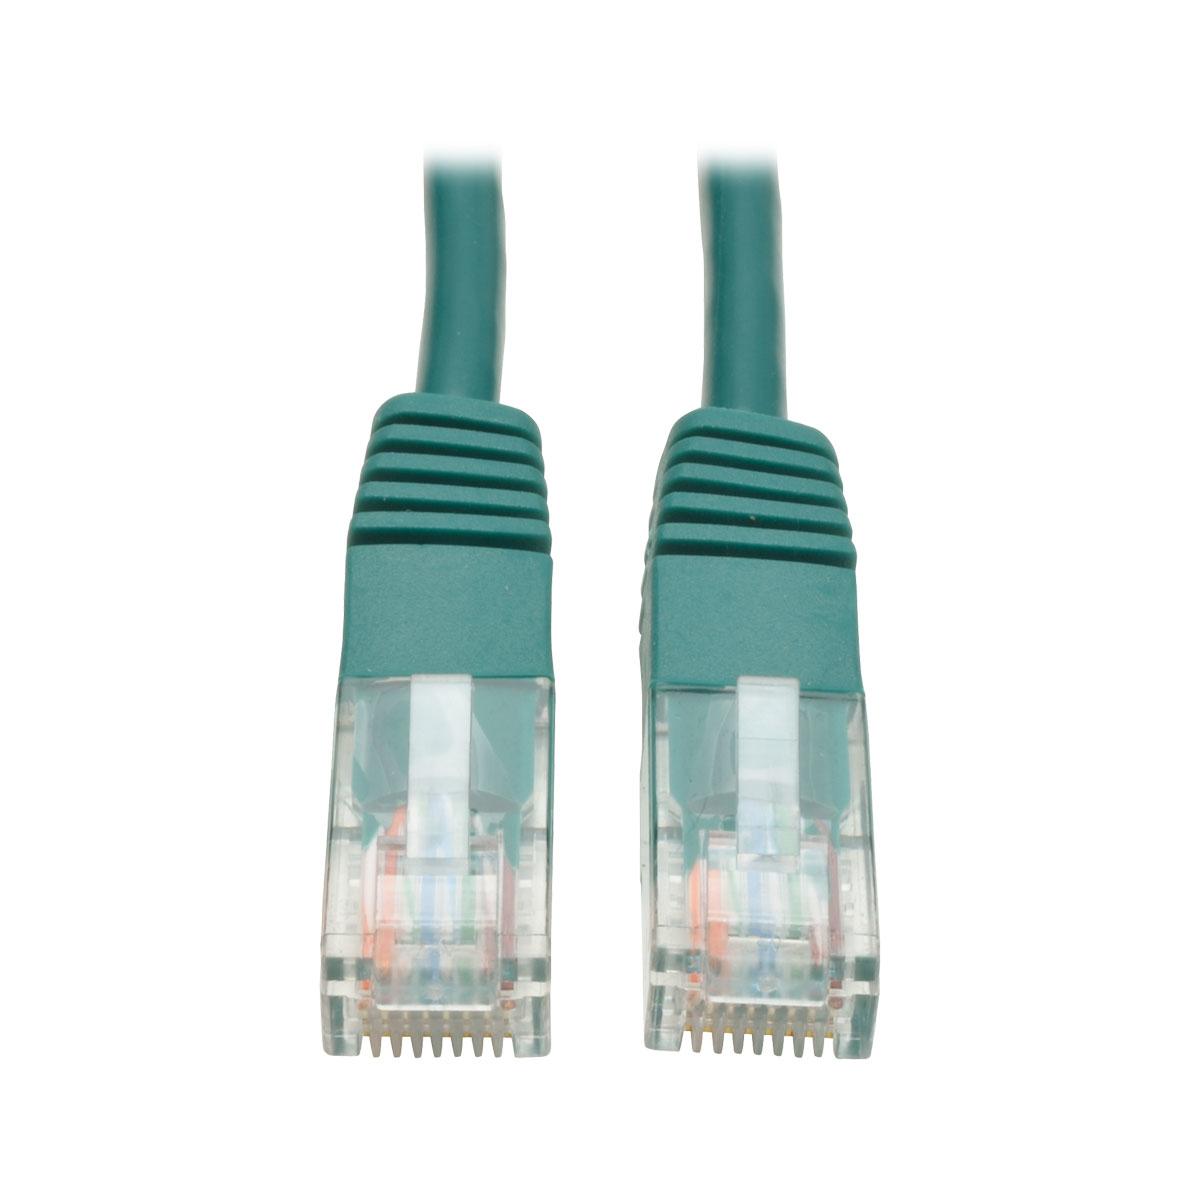 Tripp Lite Cat5e 350MHz Molded Patch Cable (RJ45 M/M) - Green, 10-ft.